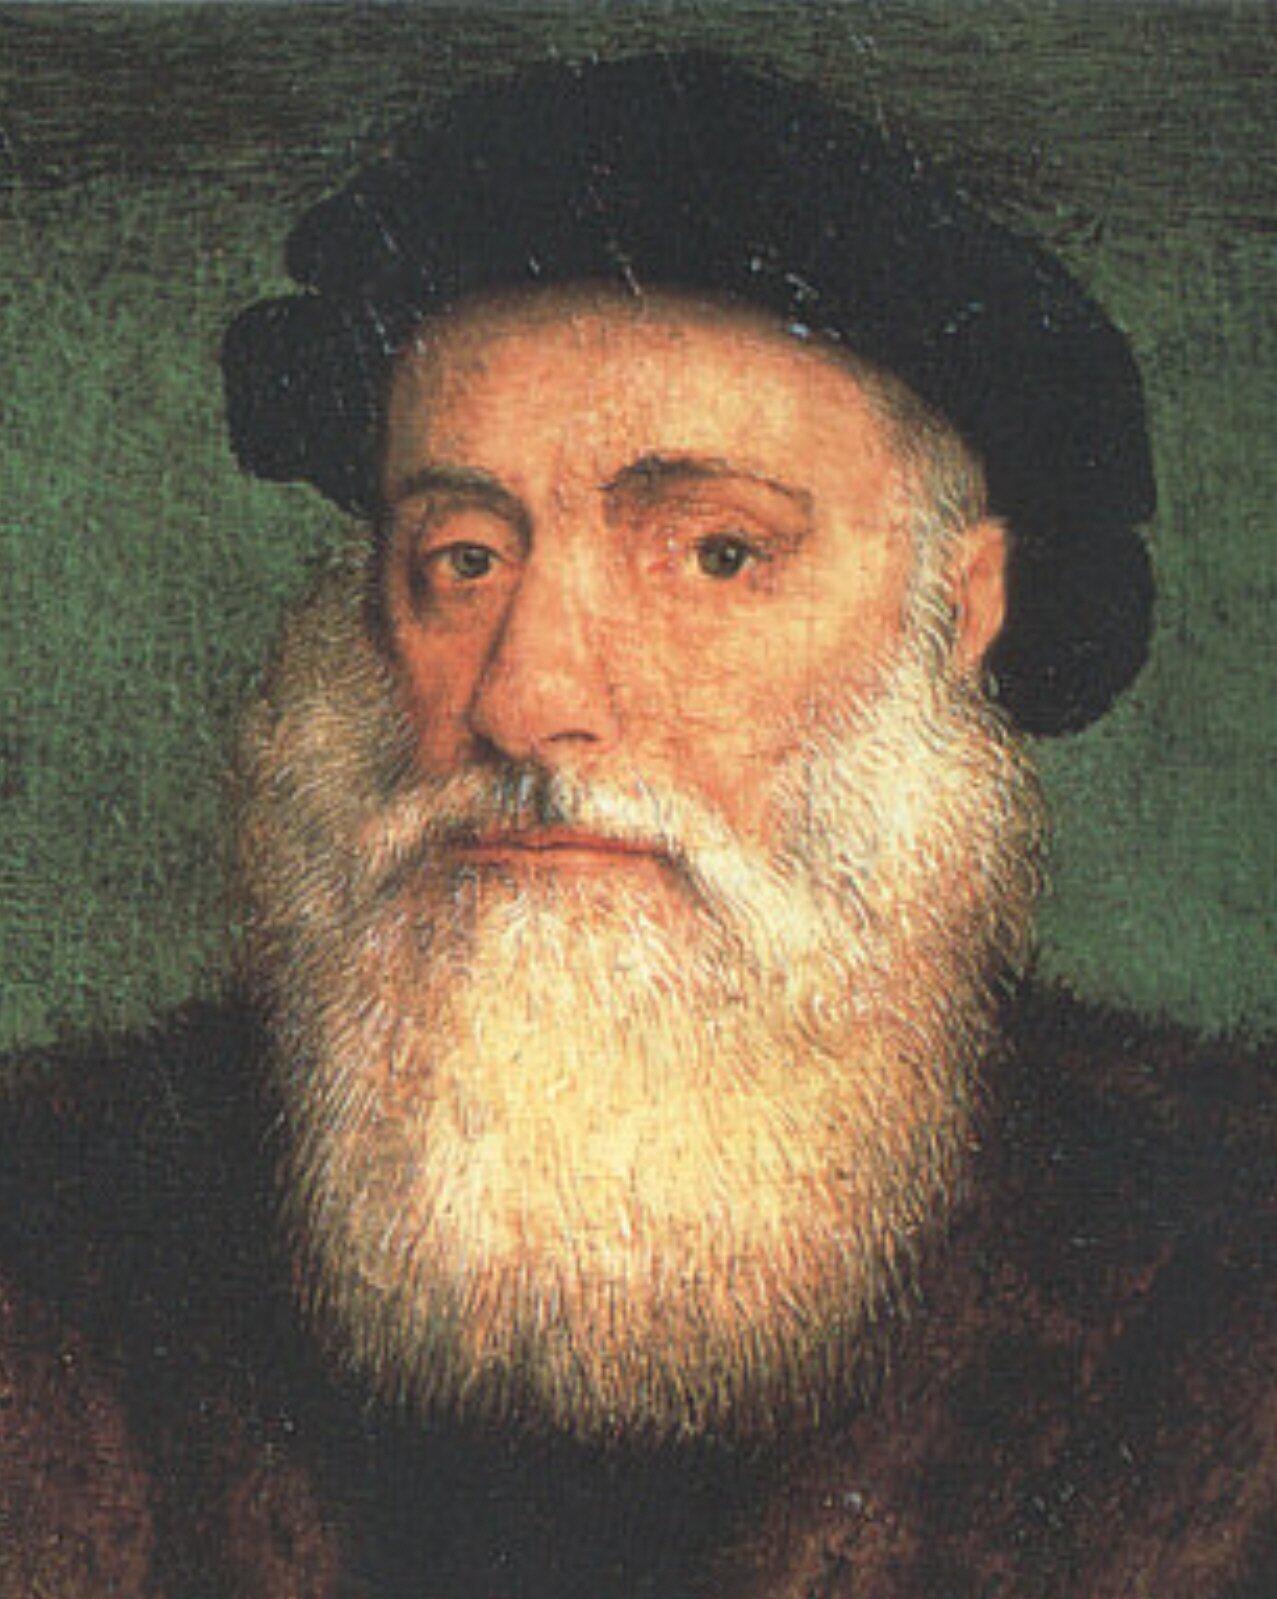 Vasco da Gama Źródło: Gregório Lopes, Vasco da Gama, ok. 1524, domena publiczna.